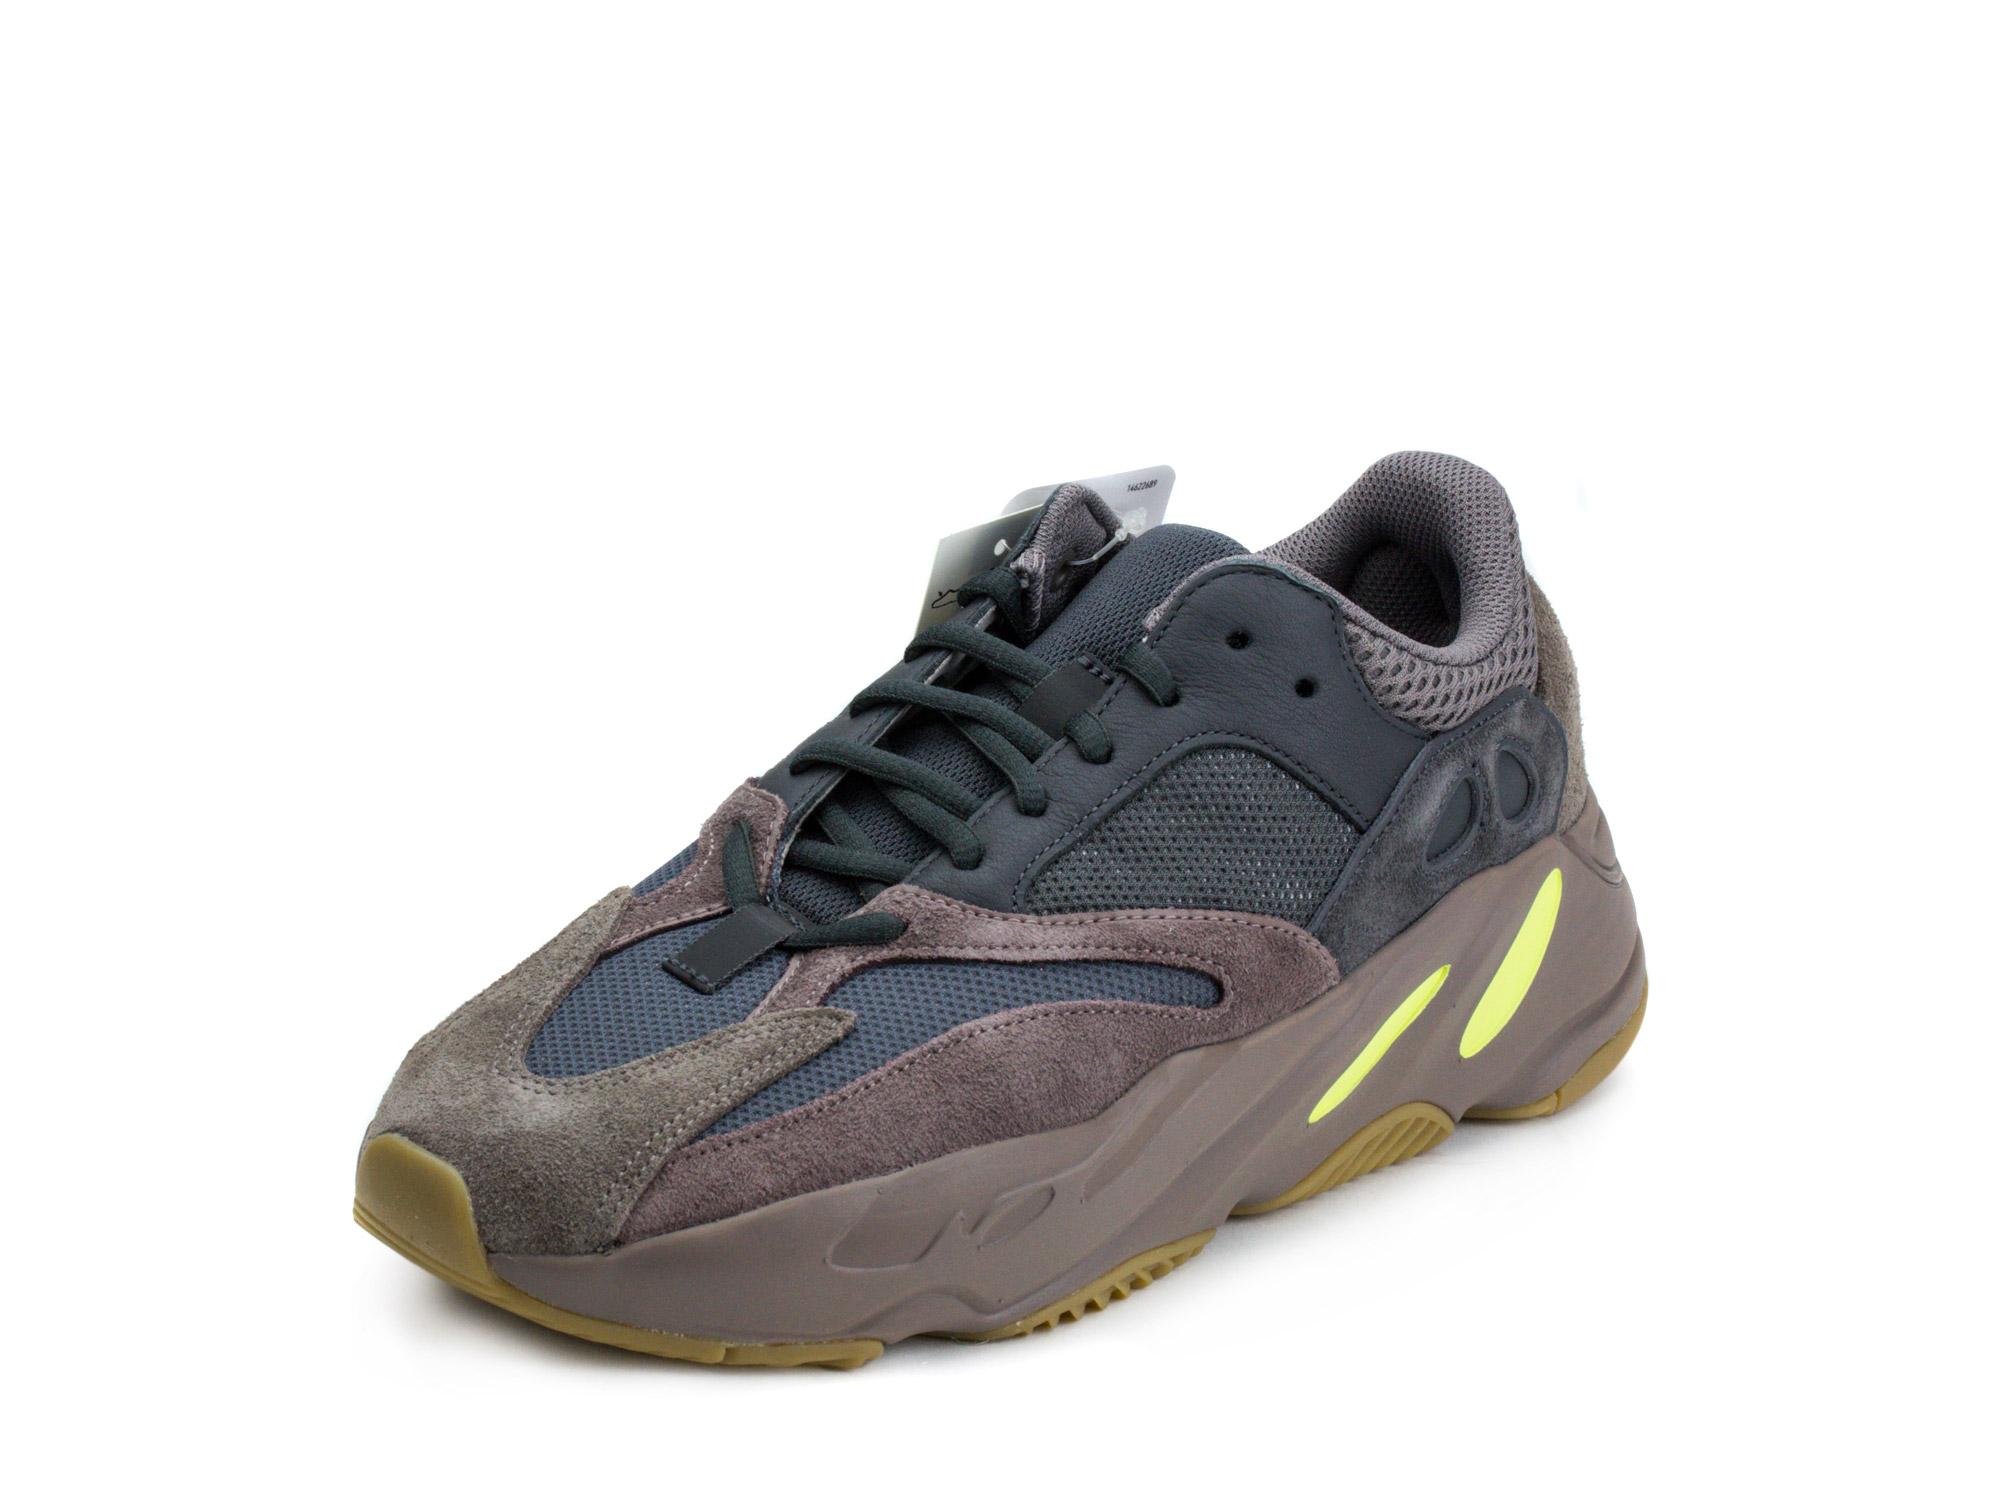 Adidas Mens Yeezy 700 \